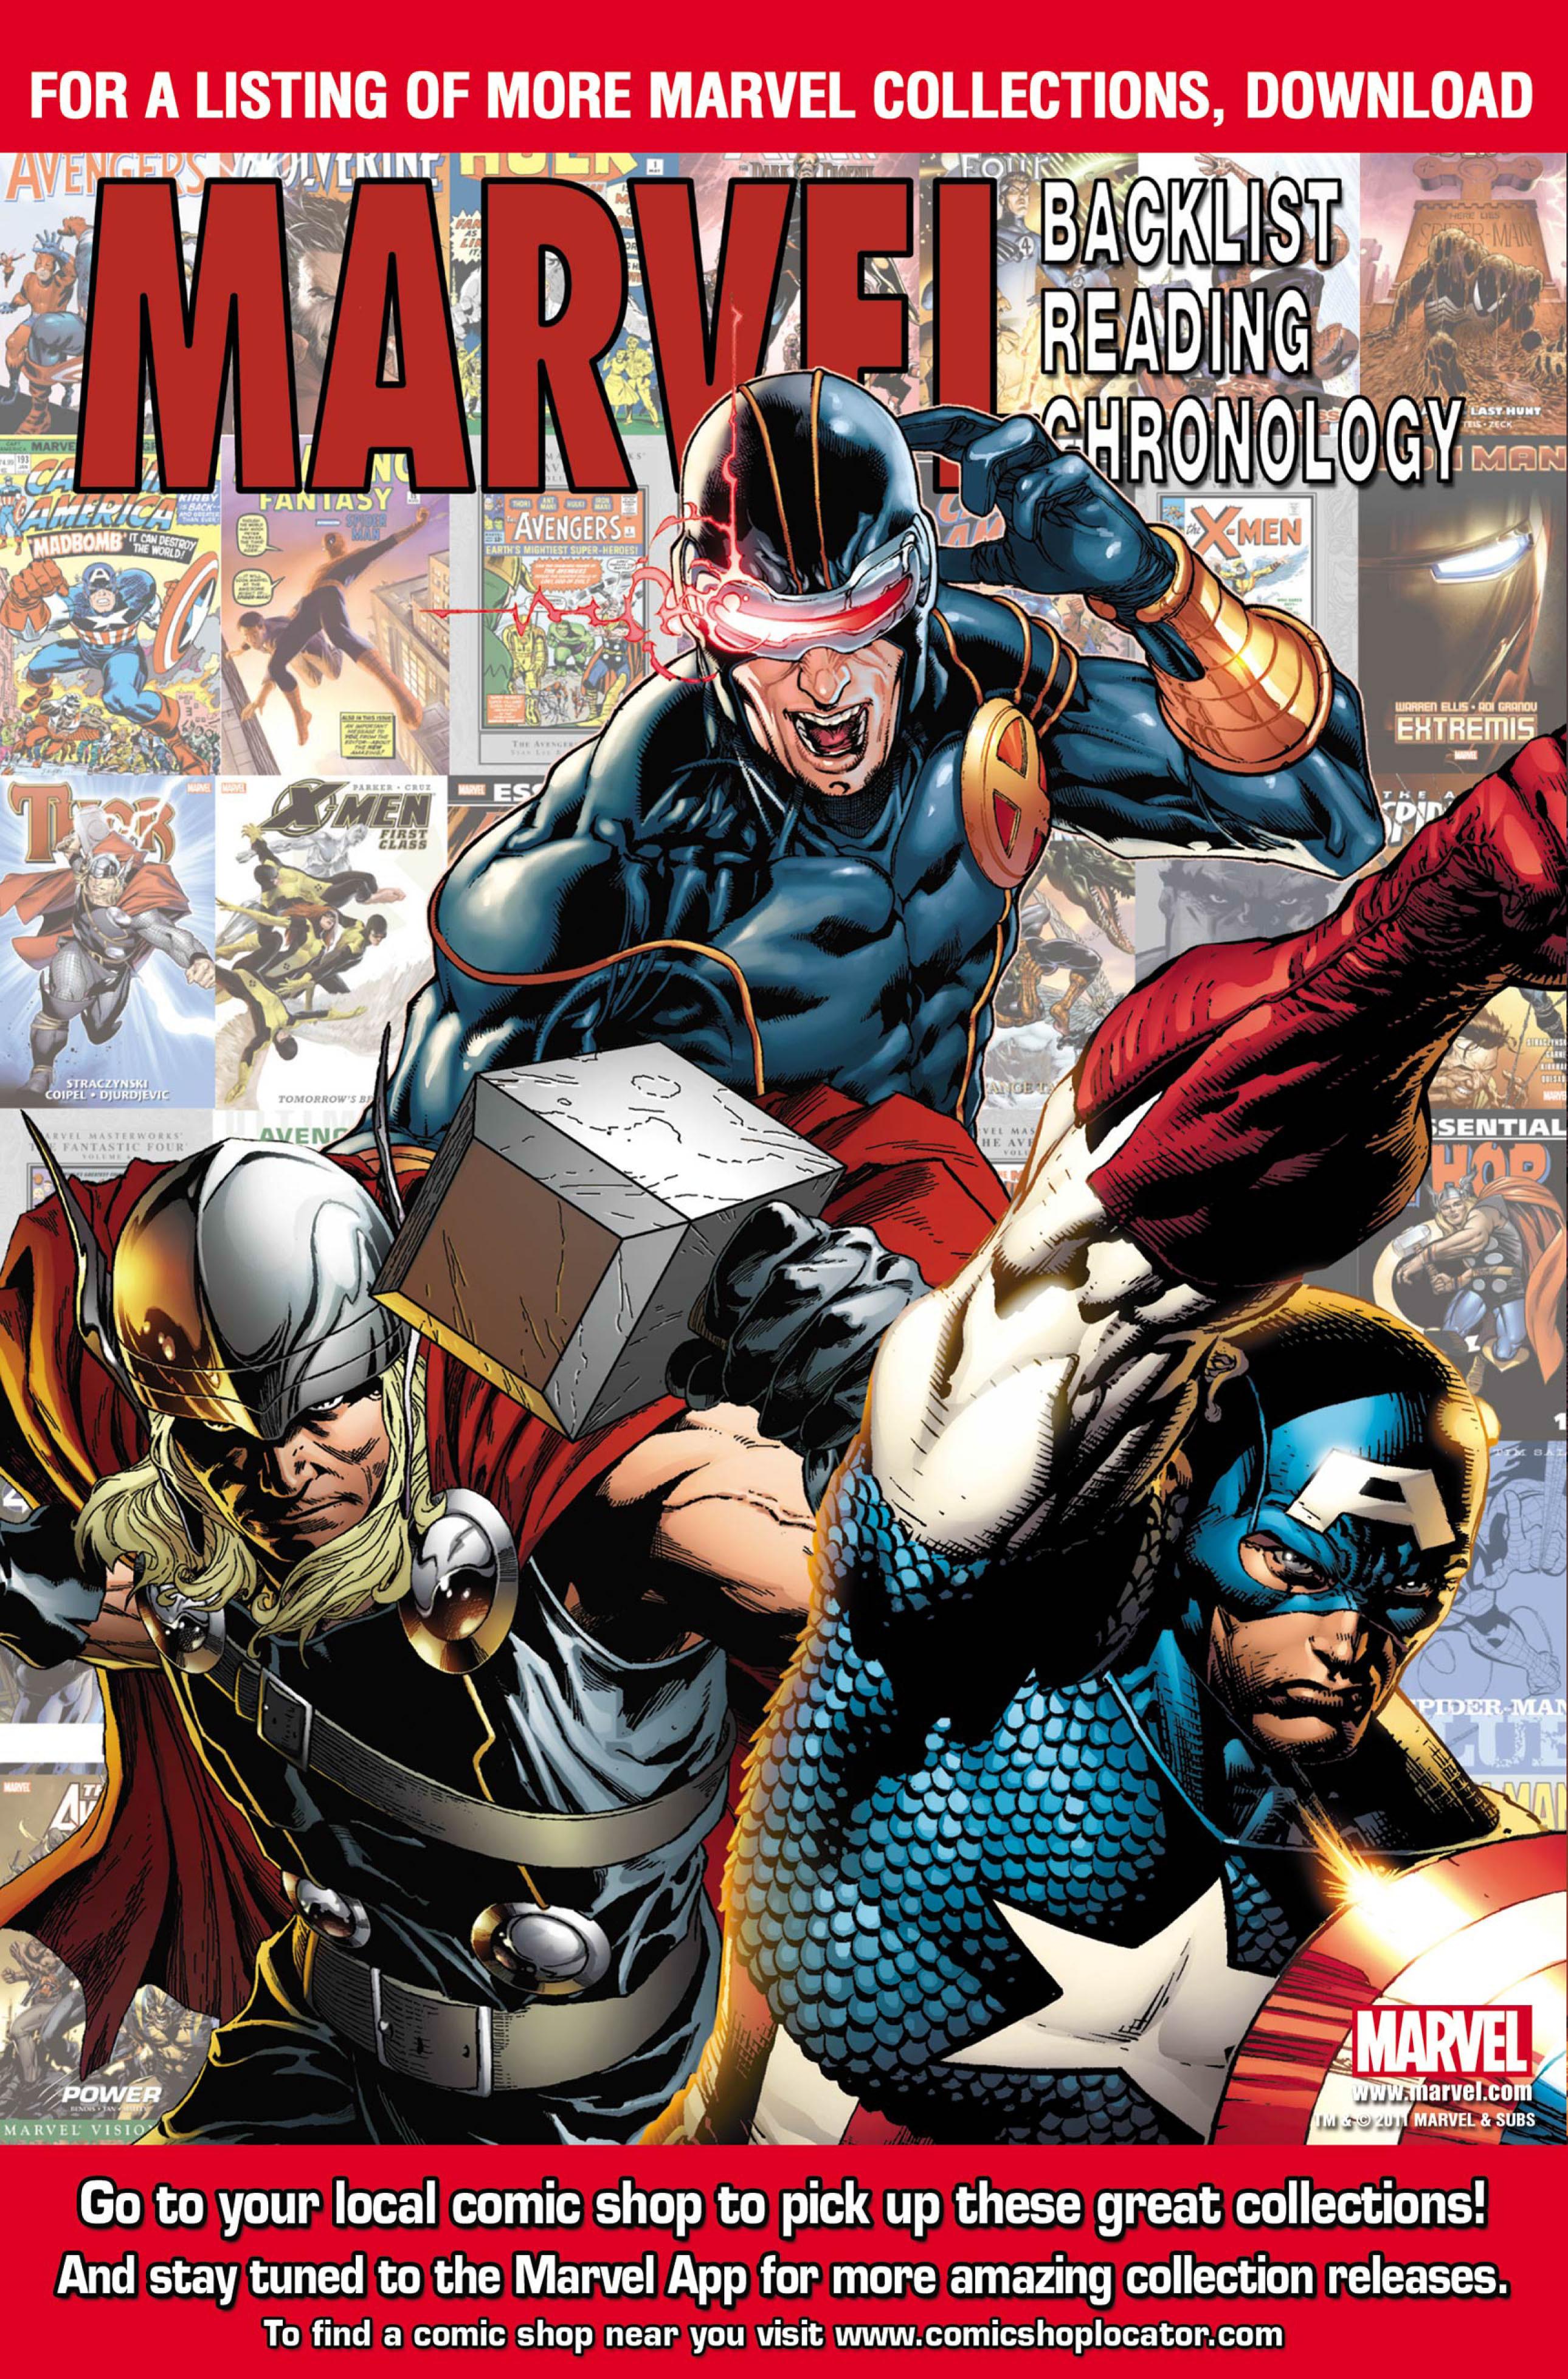 Read online Uncanny X-Men (2013) comic -  Issue # _TPB 4 - vs. S.H.I.E.L.D - 146